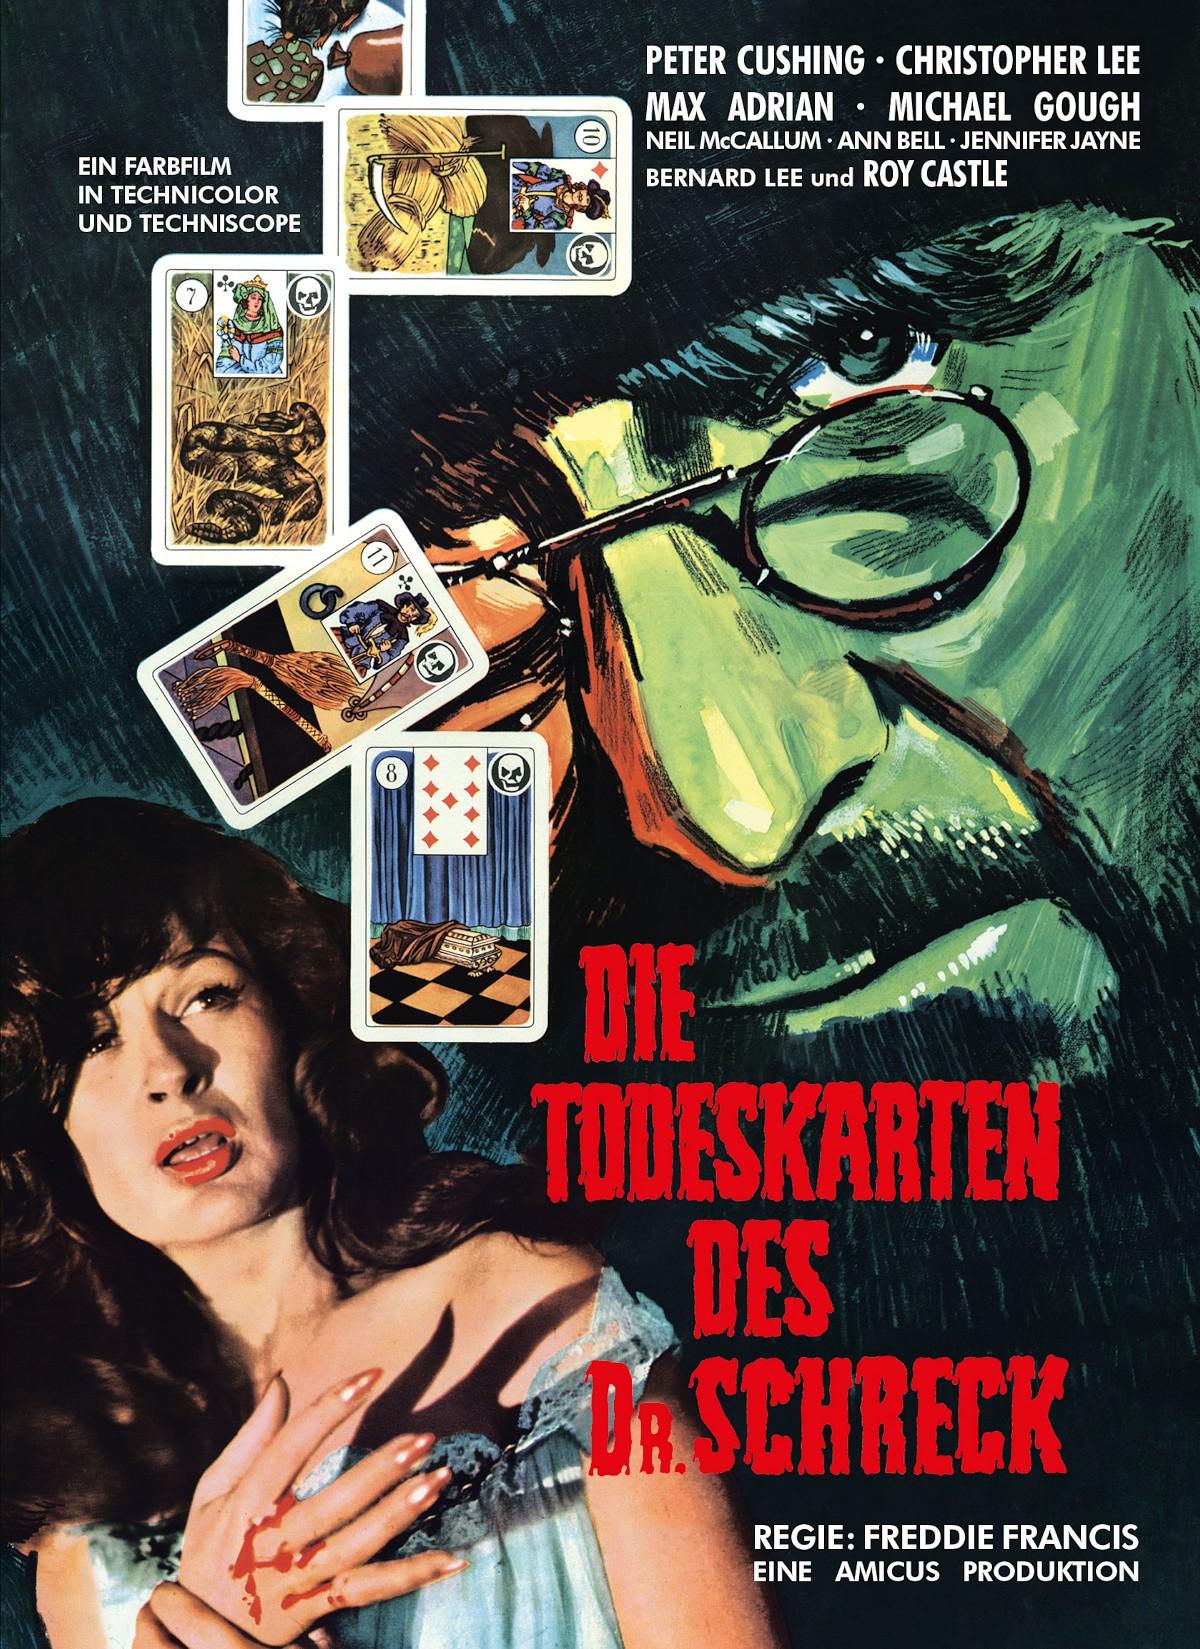 Todeskarten---Cover-A---Mediabook-front